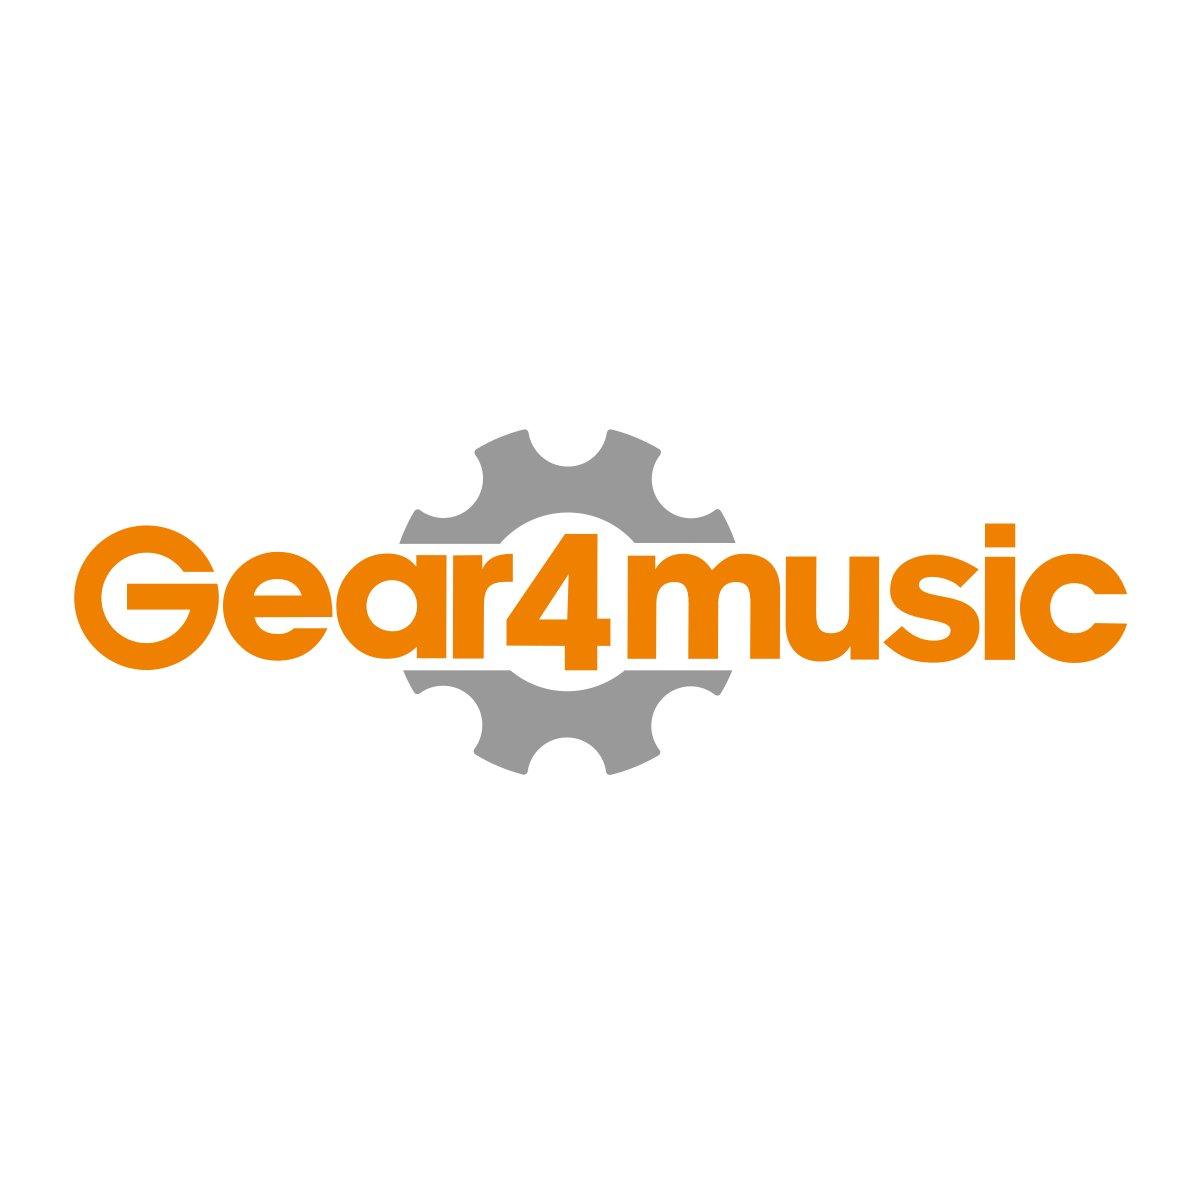 Pack de Ukelele Soprano Electroacústico Deluxe de Gear4music